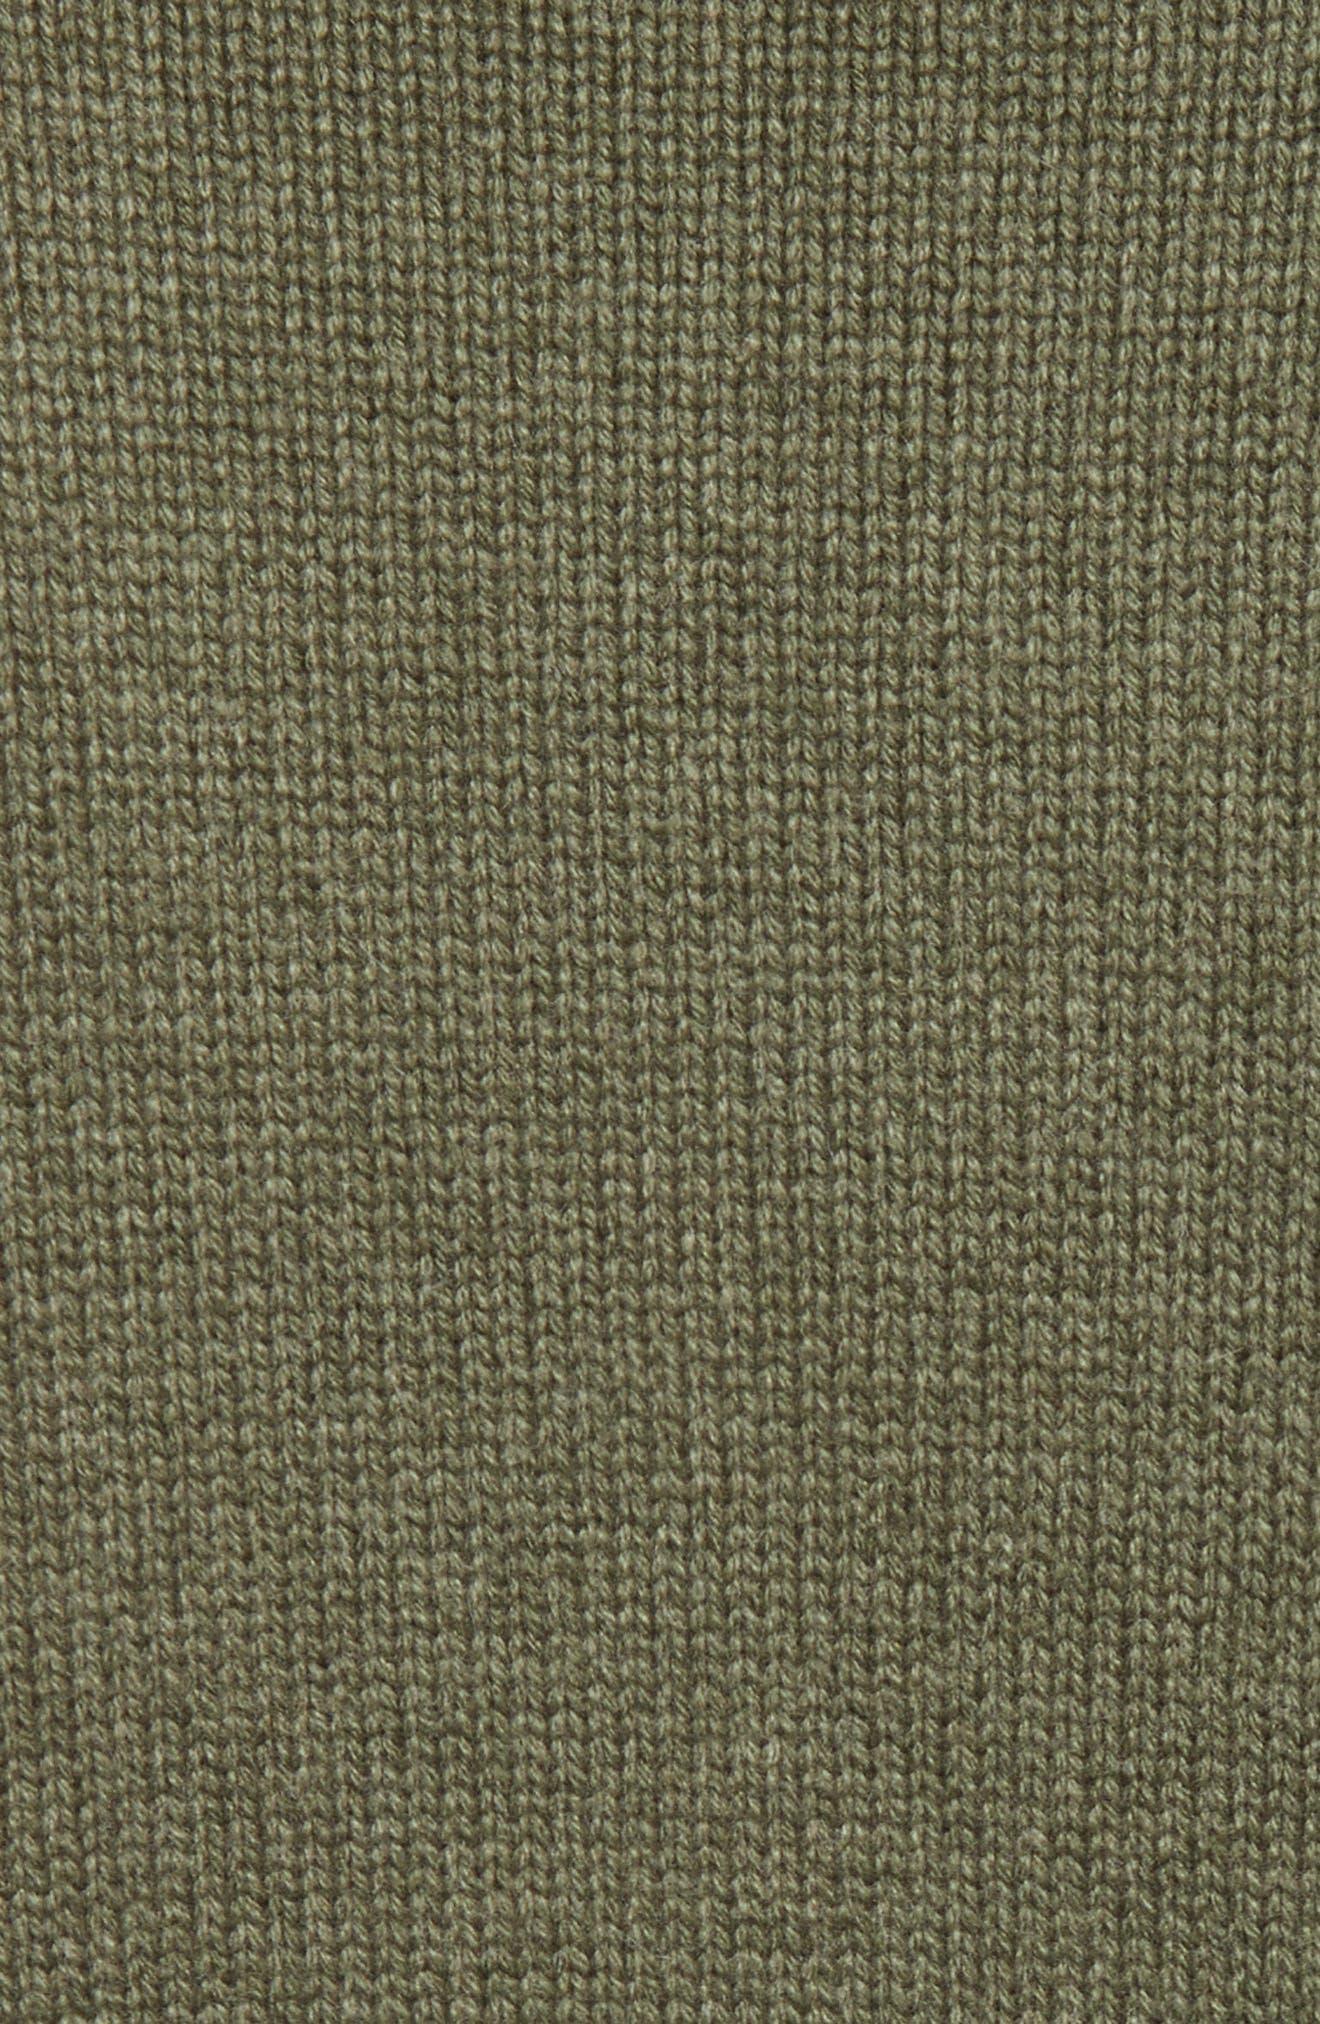 Iconic Cashmere Turtlenck Sweater,                             Alternate thumbnail 5, color,                             301